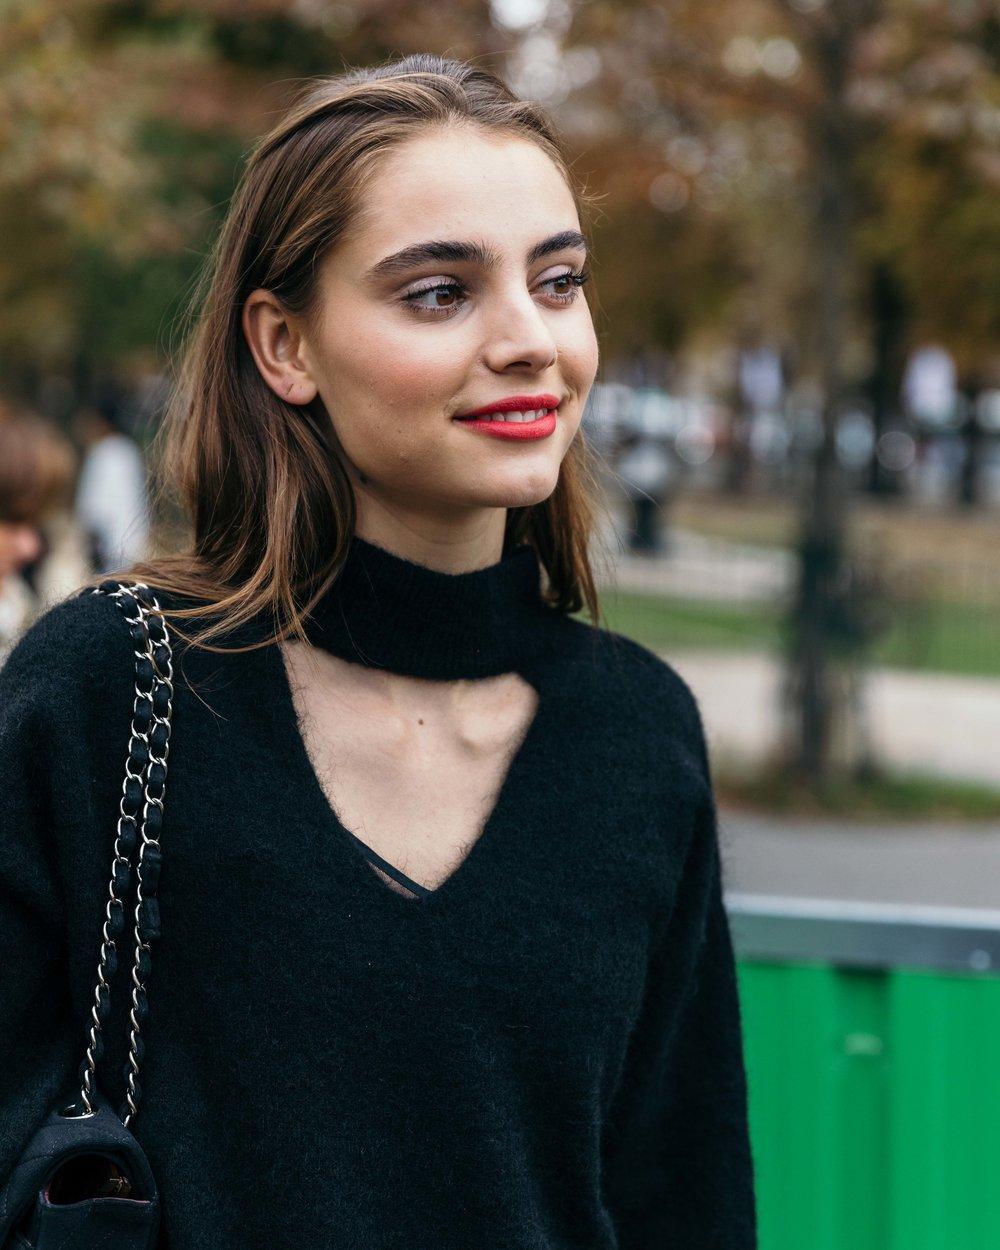 Streetstyle-photography-Chanel-Paris-Fashion-Week-copyright-Alexis-Breugelmans-040.jpg